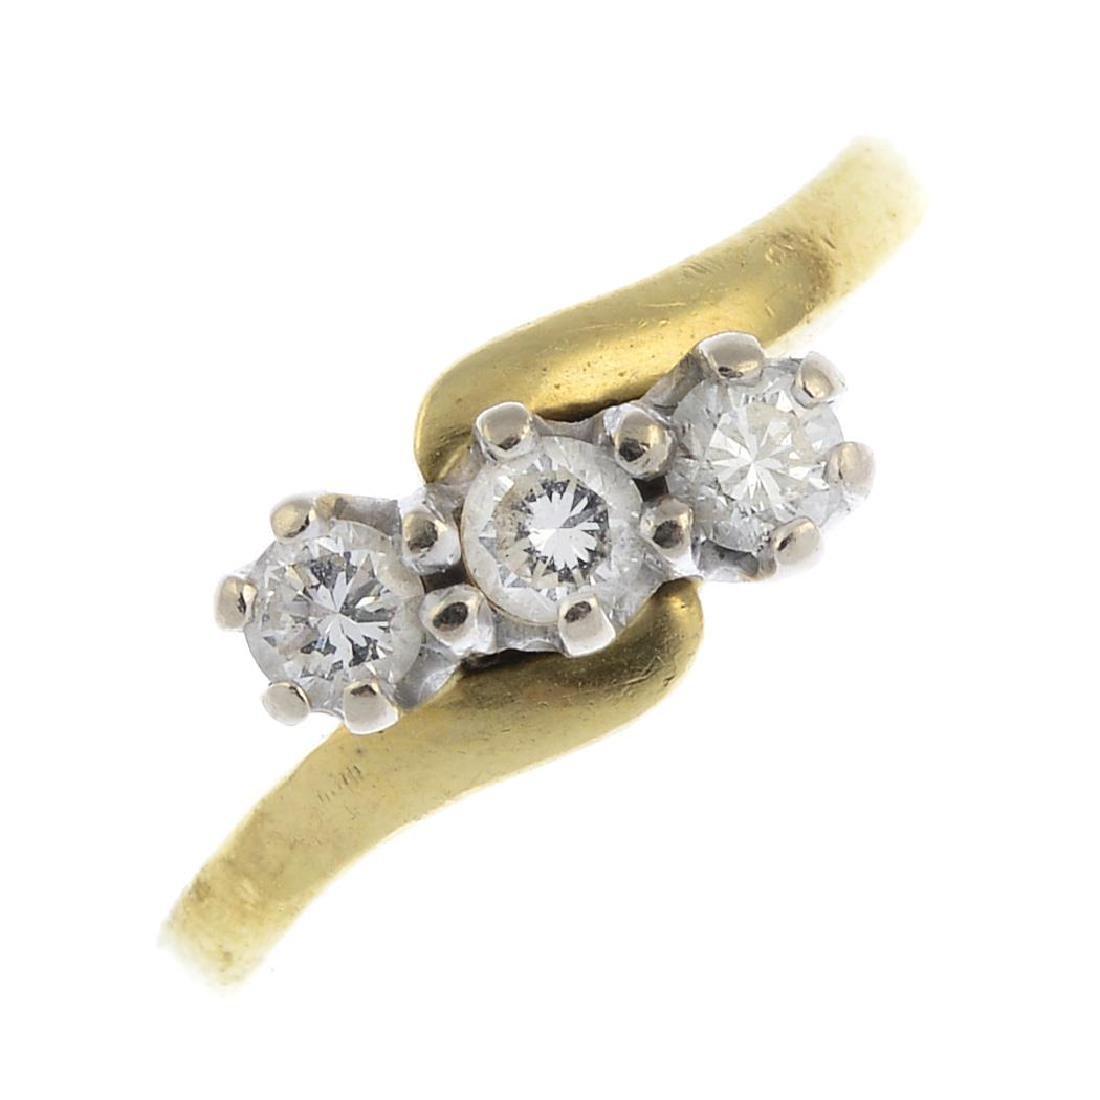 An 18ct gold diamond three-stone ring. The